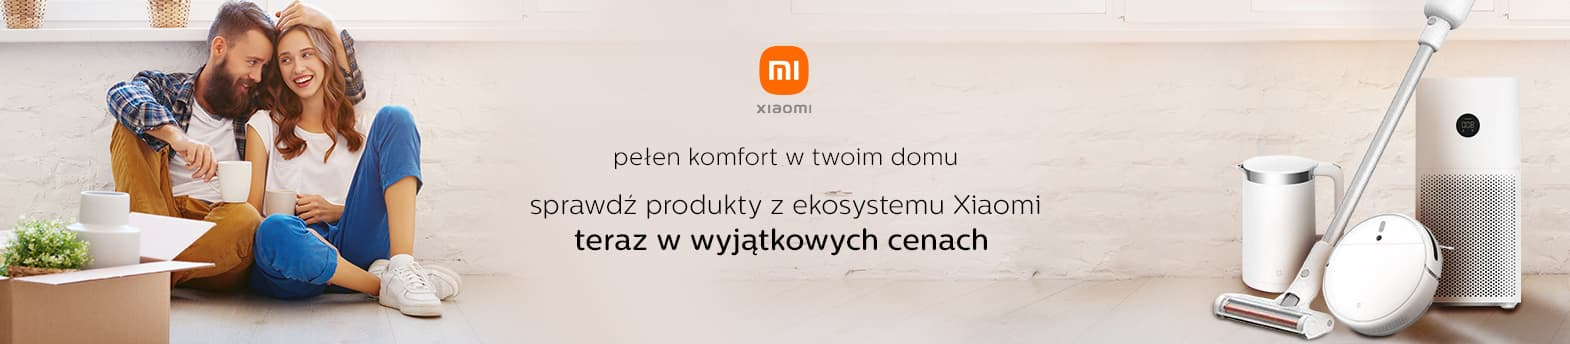 Xiaomi z rabatami